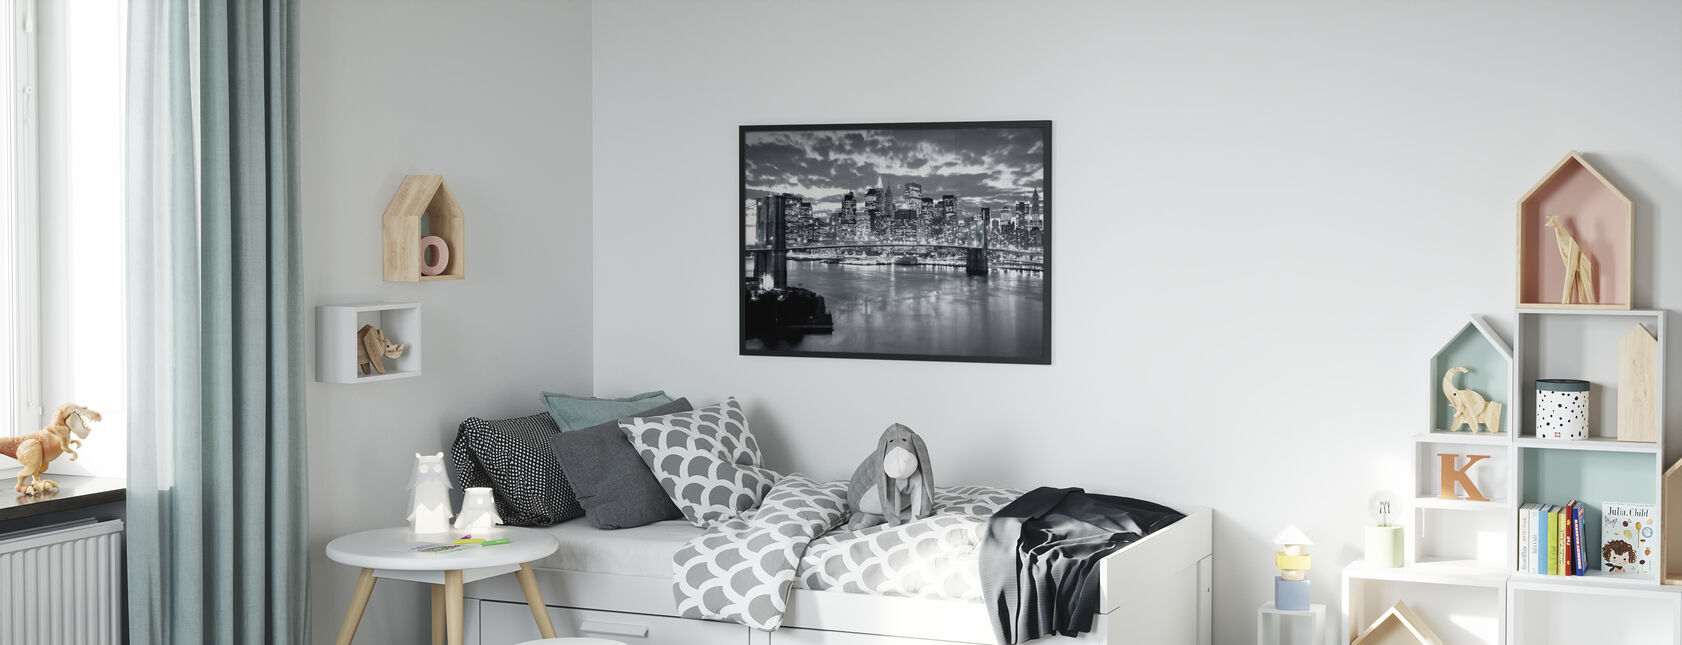 Brooklyn Bridge Cloudy Day - Poster - Kids Room